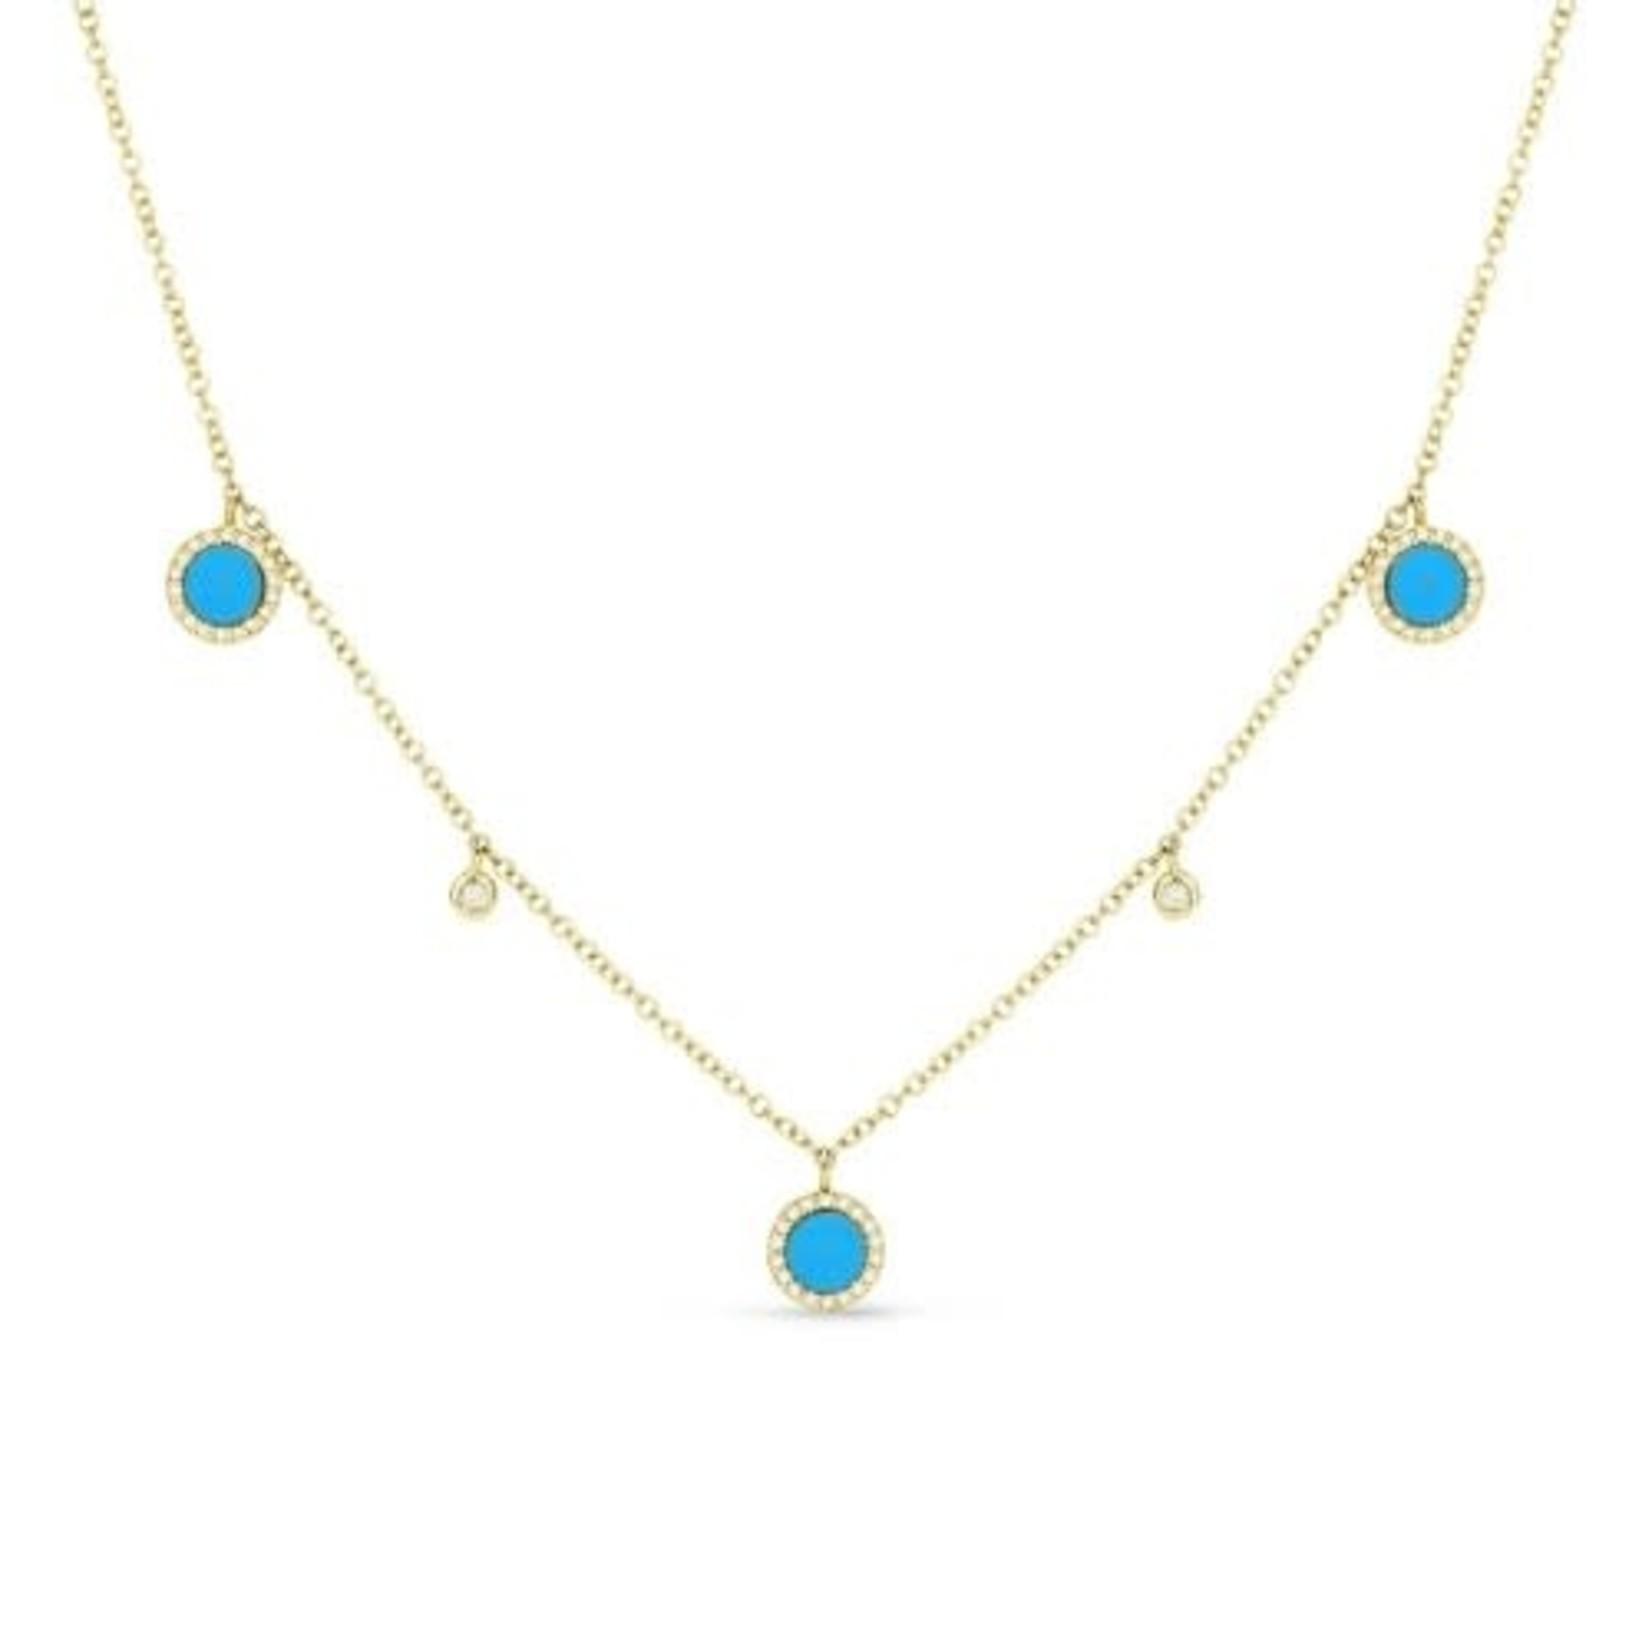 Gold Diamond & Turquoise Station Necklace